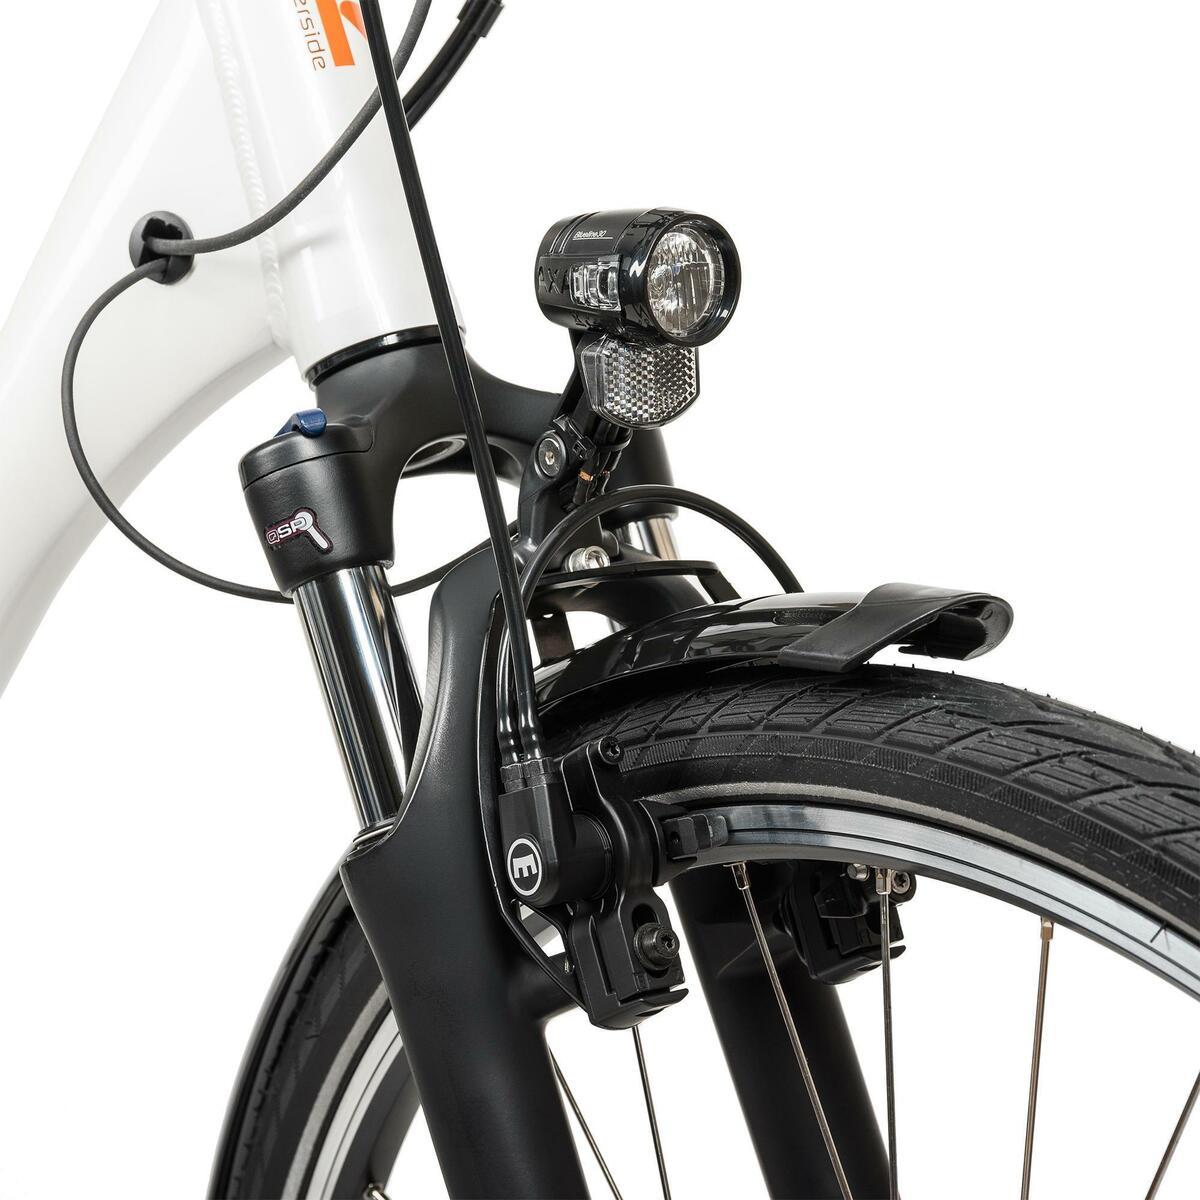 Bild 5 von E-Bike 28 Riverside City XT Performance Cruise 400Wh